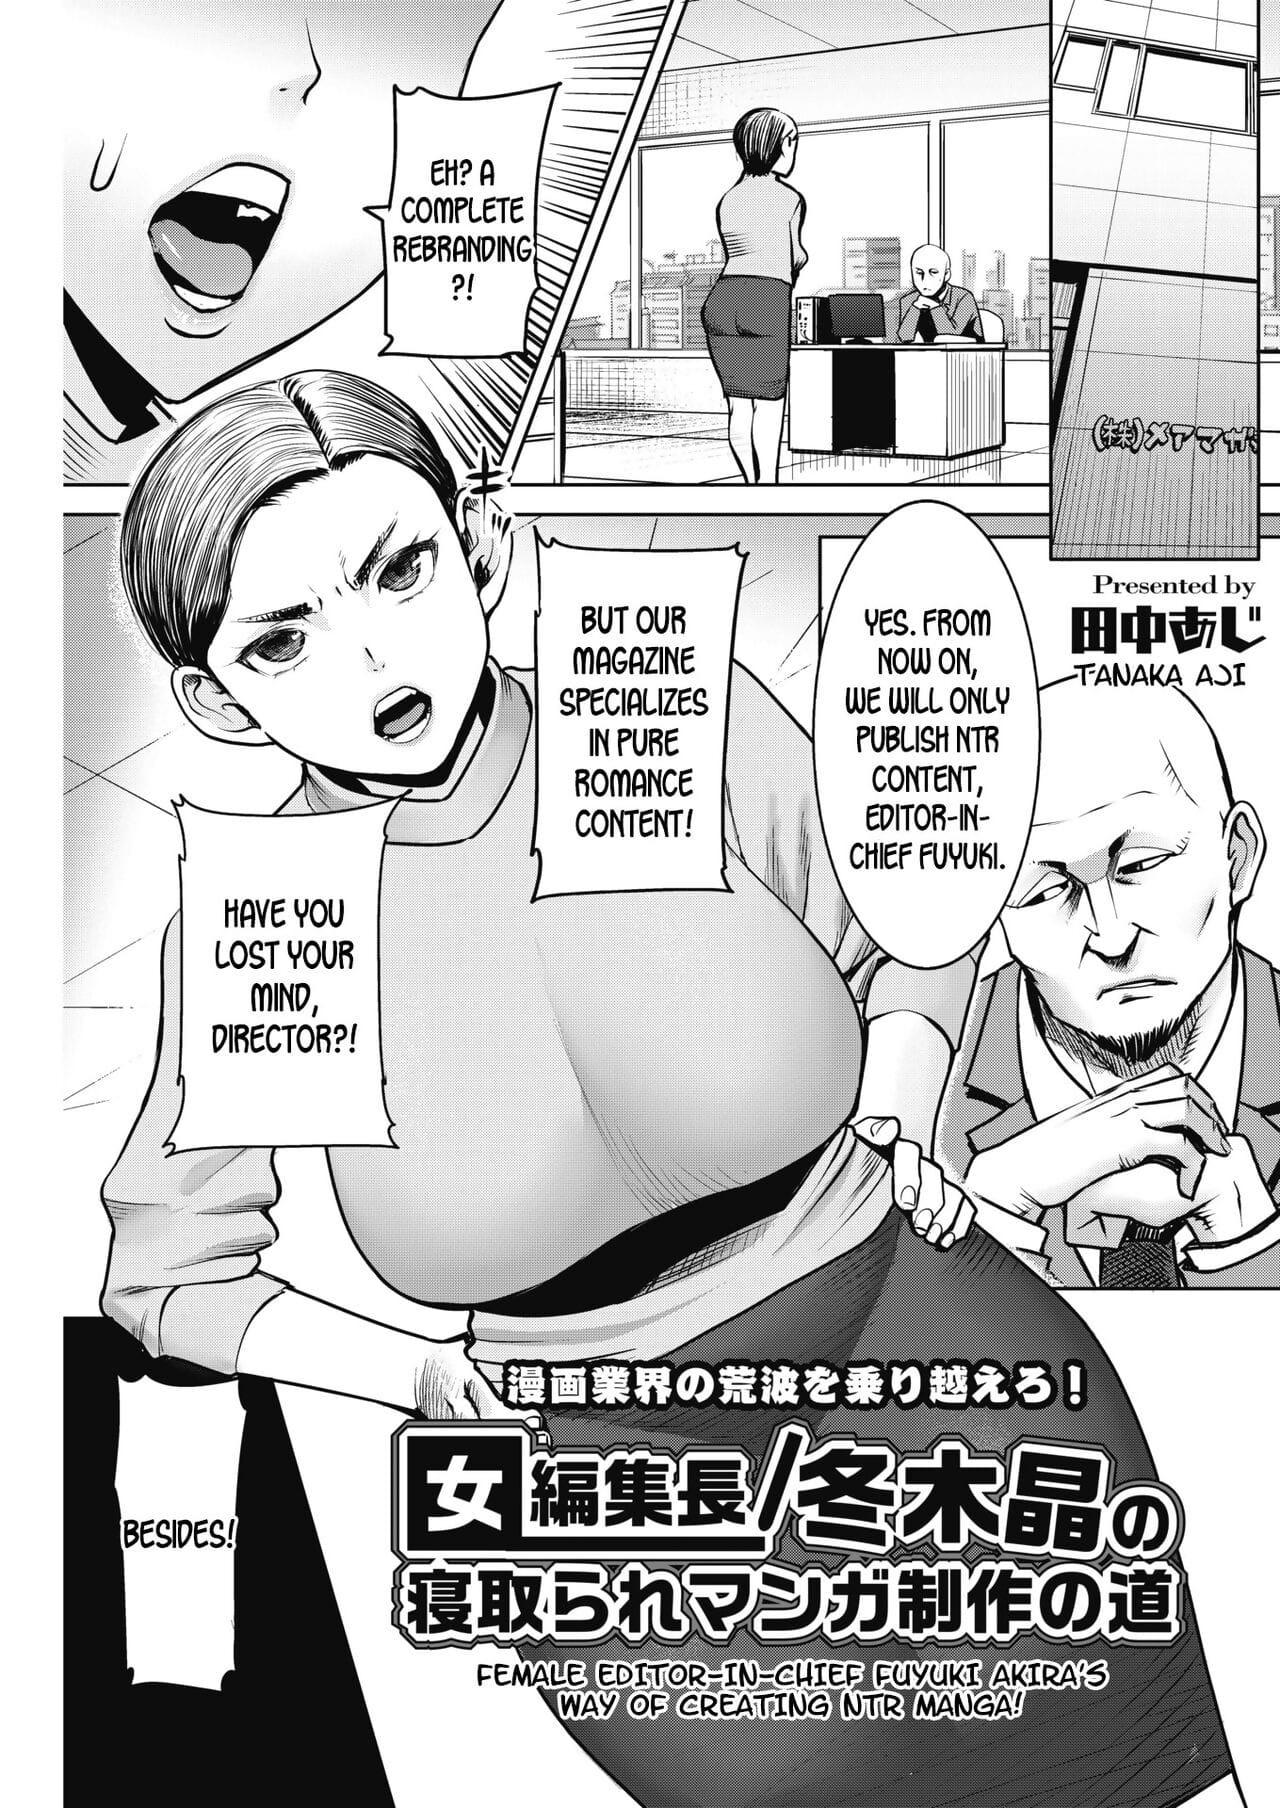 Onna Henshuuchou / Fuyuki Akira hardly any Netotare Manga Seisaku hardly any Michi - Womanlike Editor-in-Chief Fuyuki Akira's Resembling be useful to Creating NTR Manga!